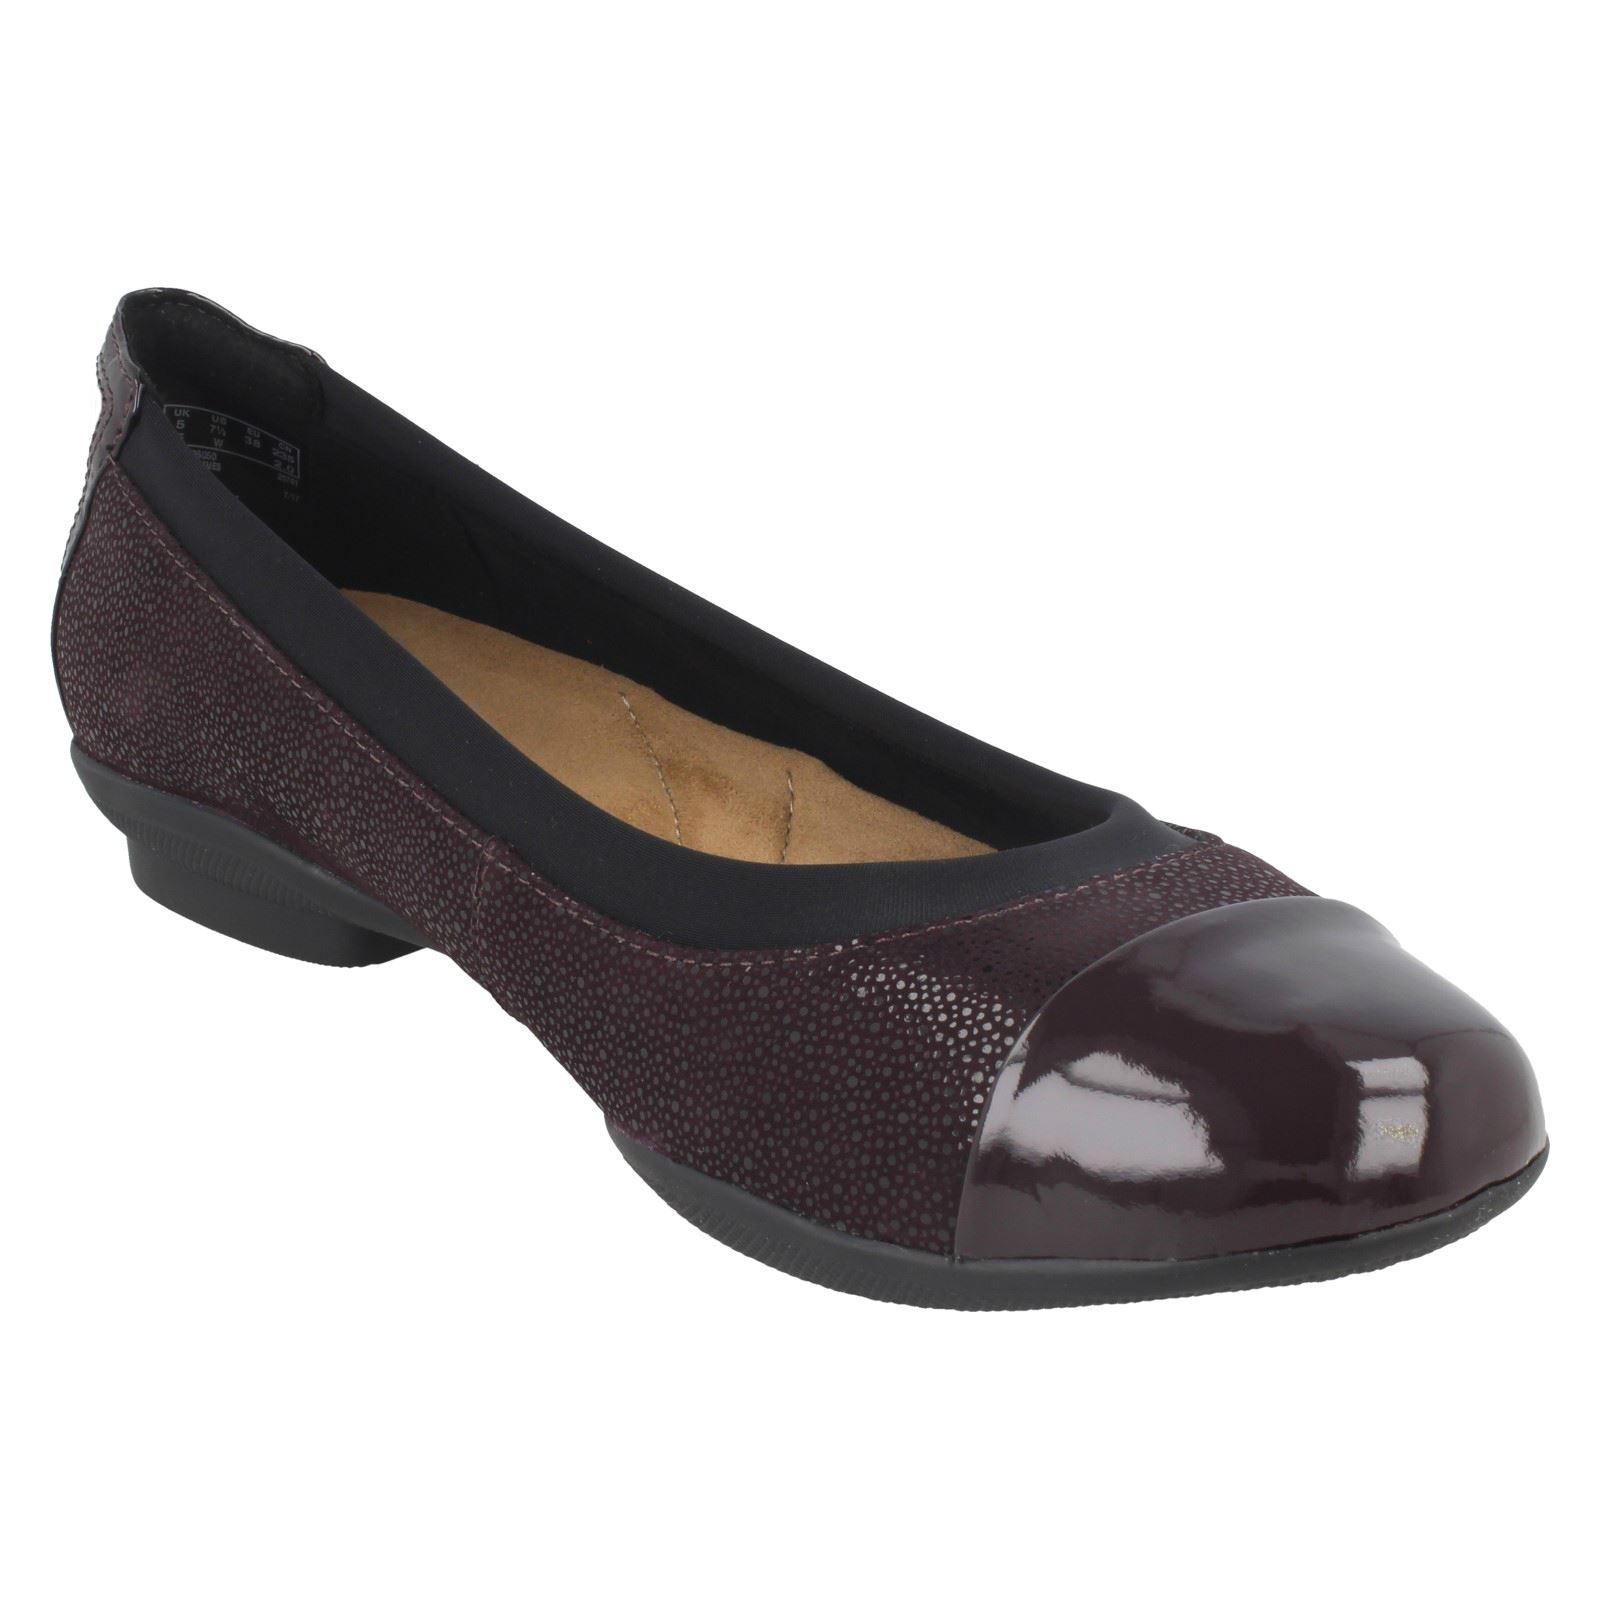 Ladies Clarks Neenah Neenah Neenah Garden Ballerina Flats 8b4c89